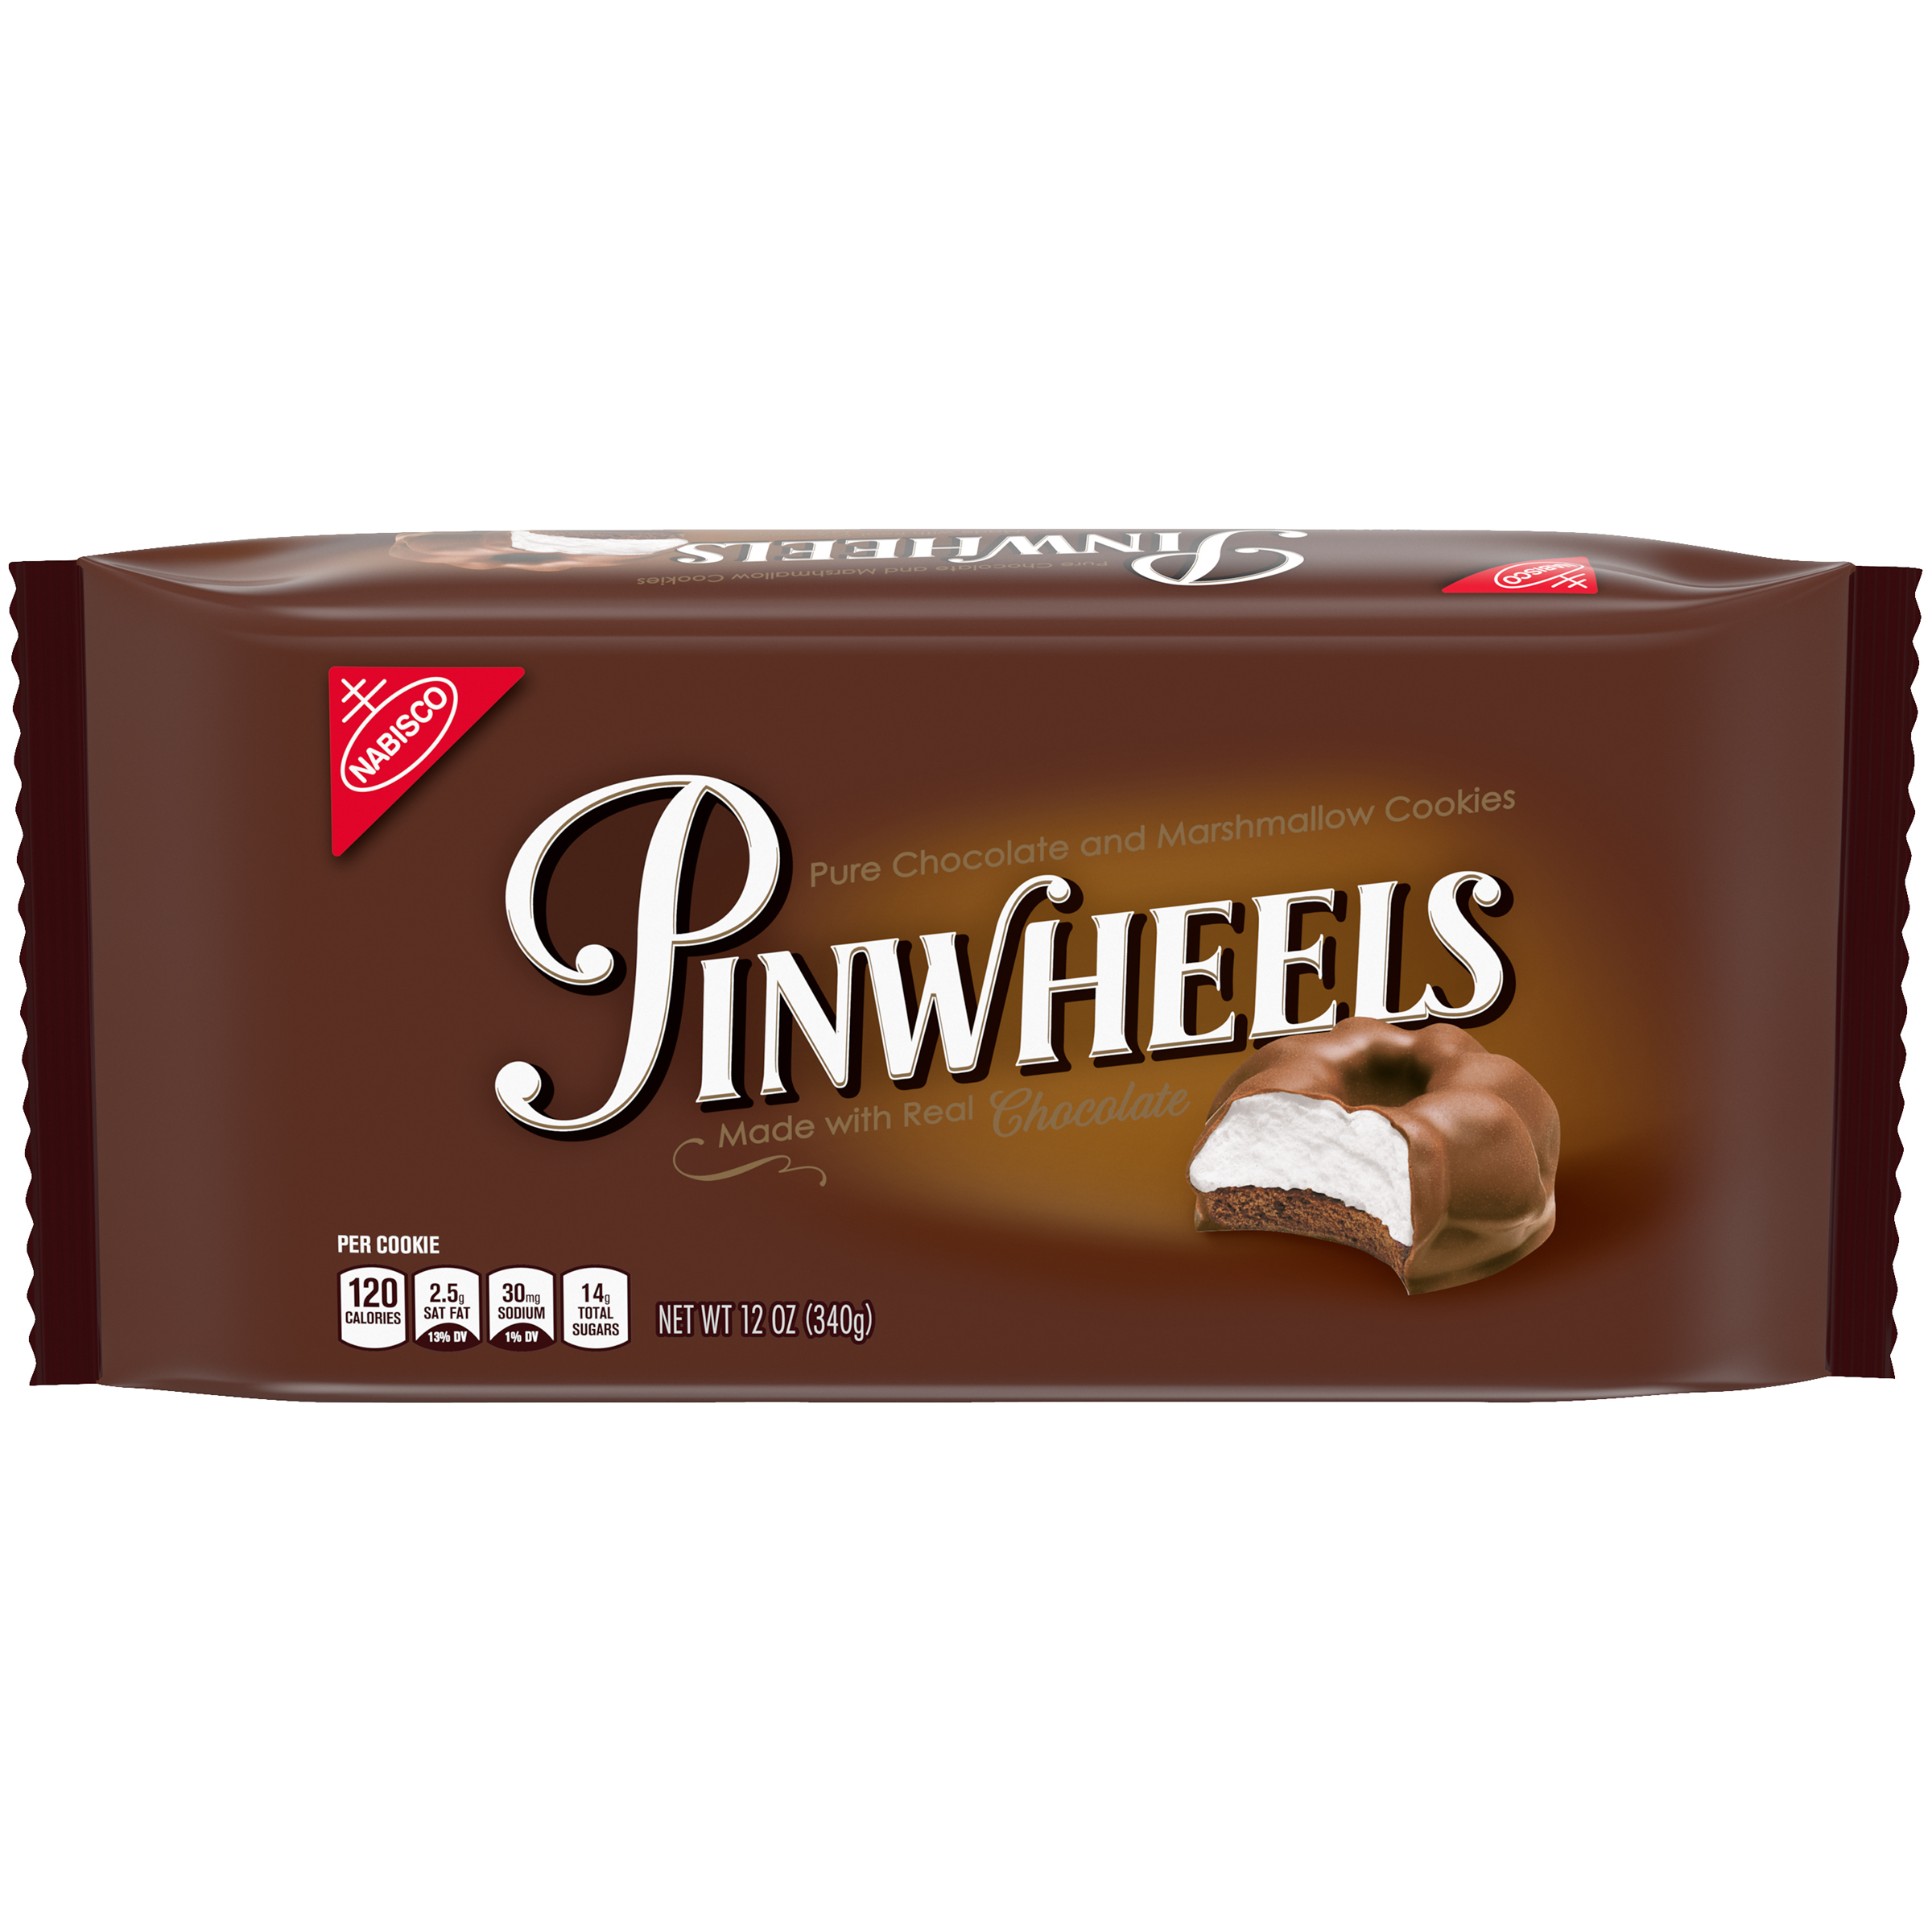 PINWHEELS Marshmallow Cookies 12 oz